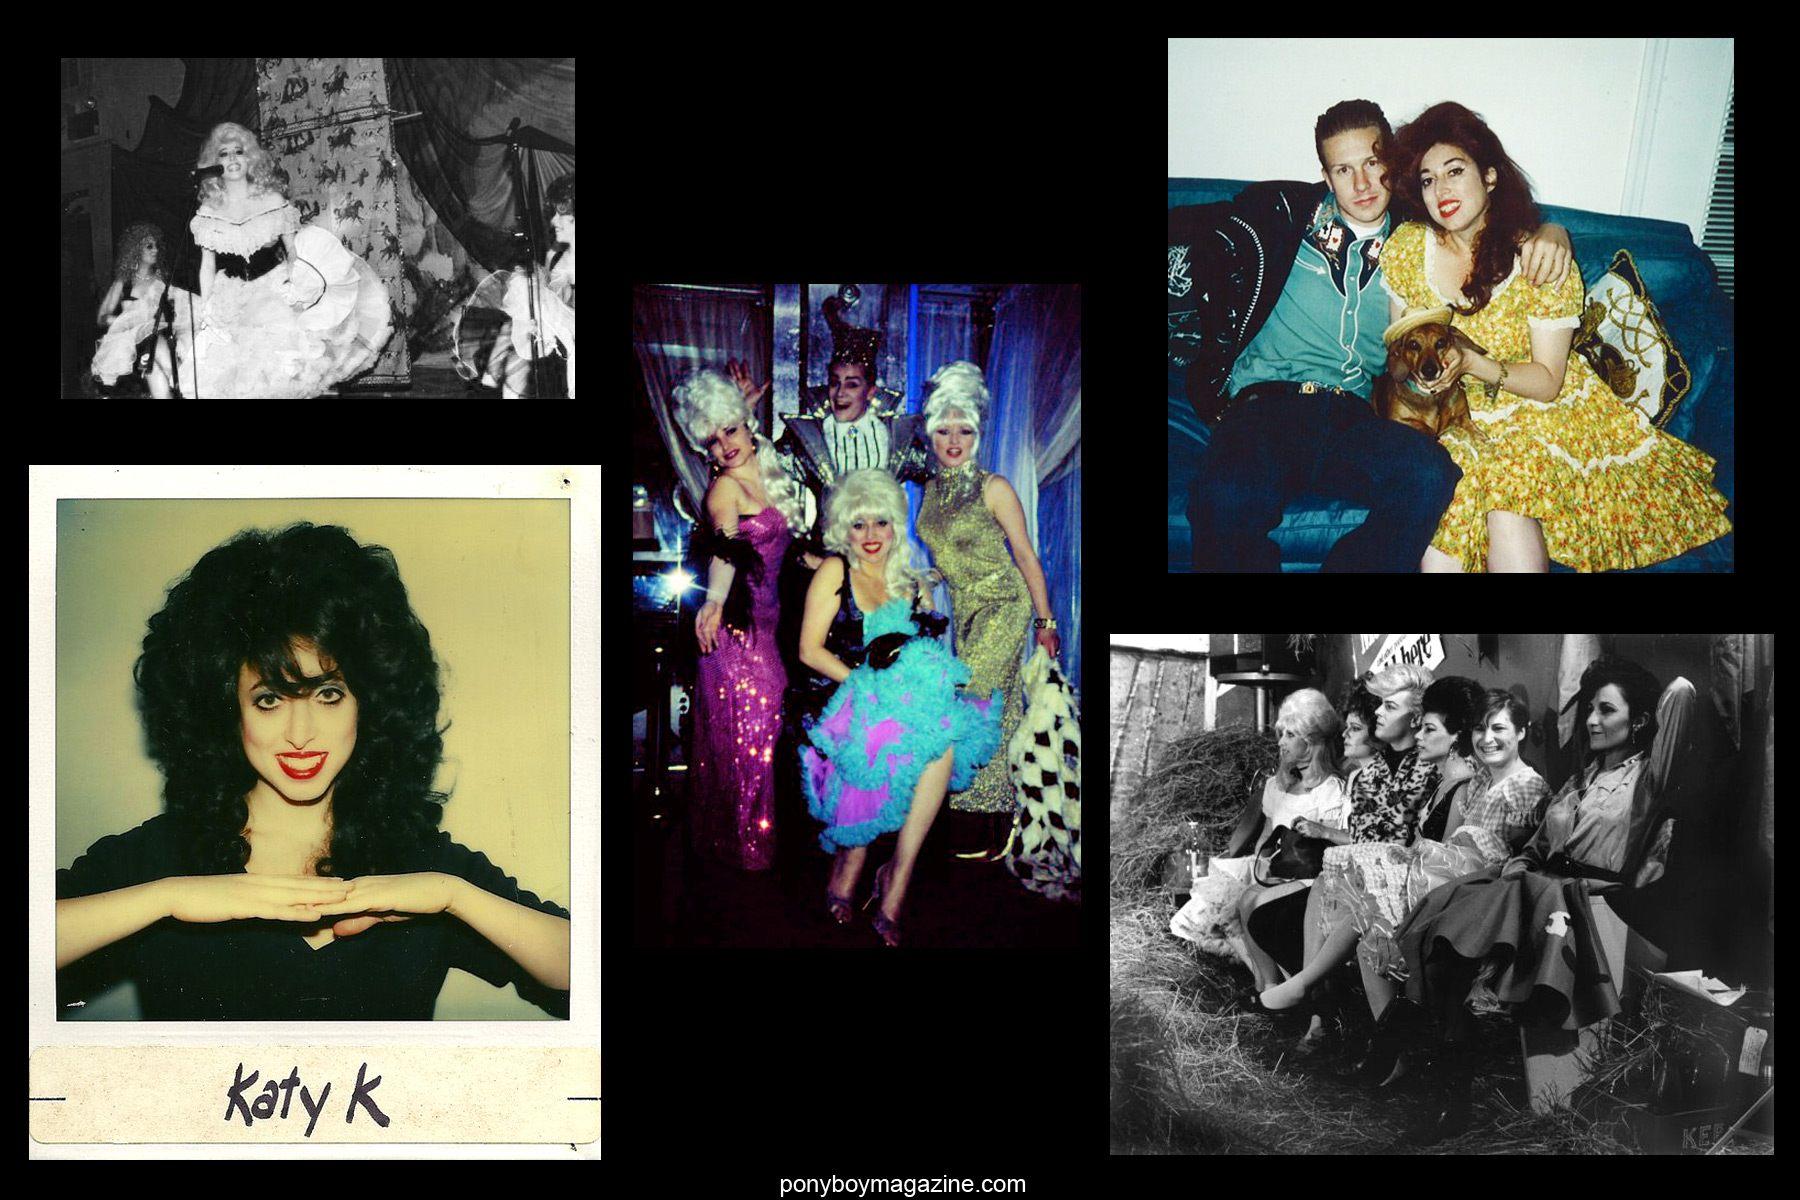 Assorted old photos of Katy K and John Sex for Ponyboy Magazine.